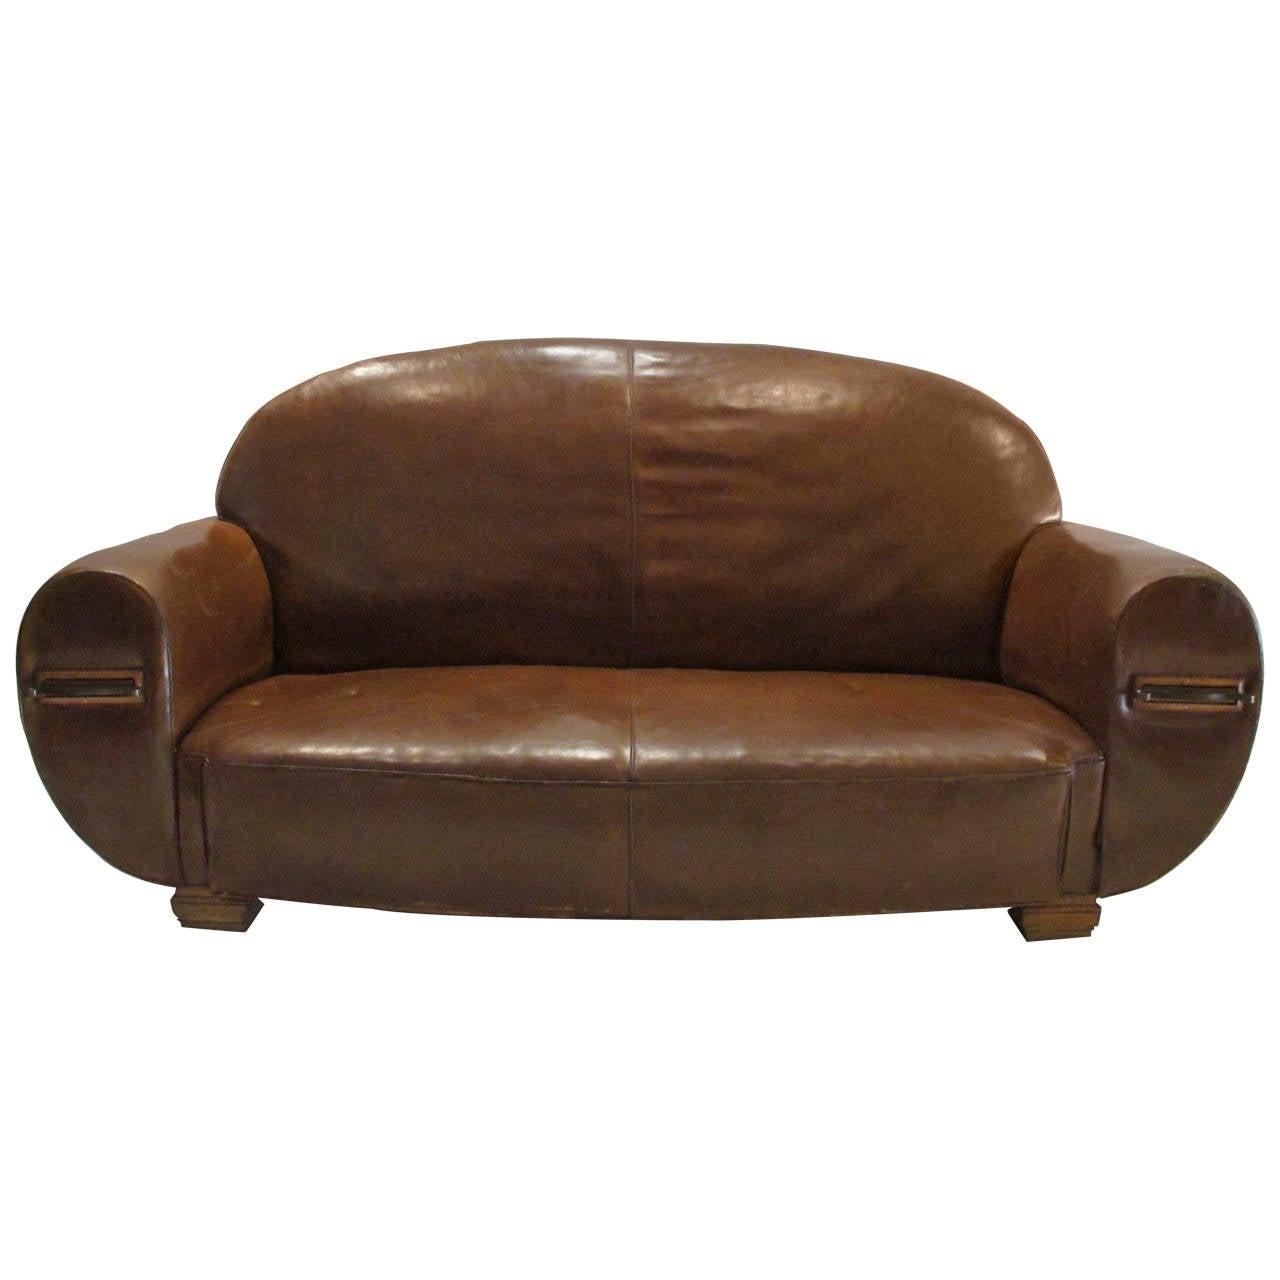 Art deco sofa at 1stdibs for Art deco era dates